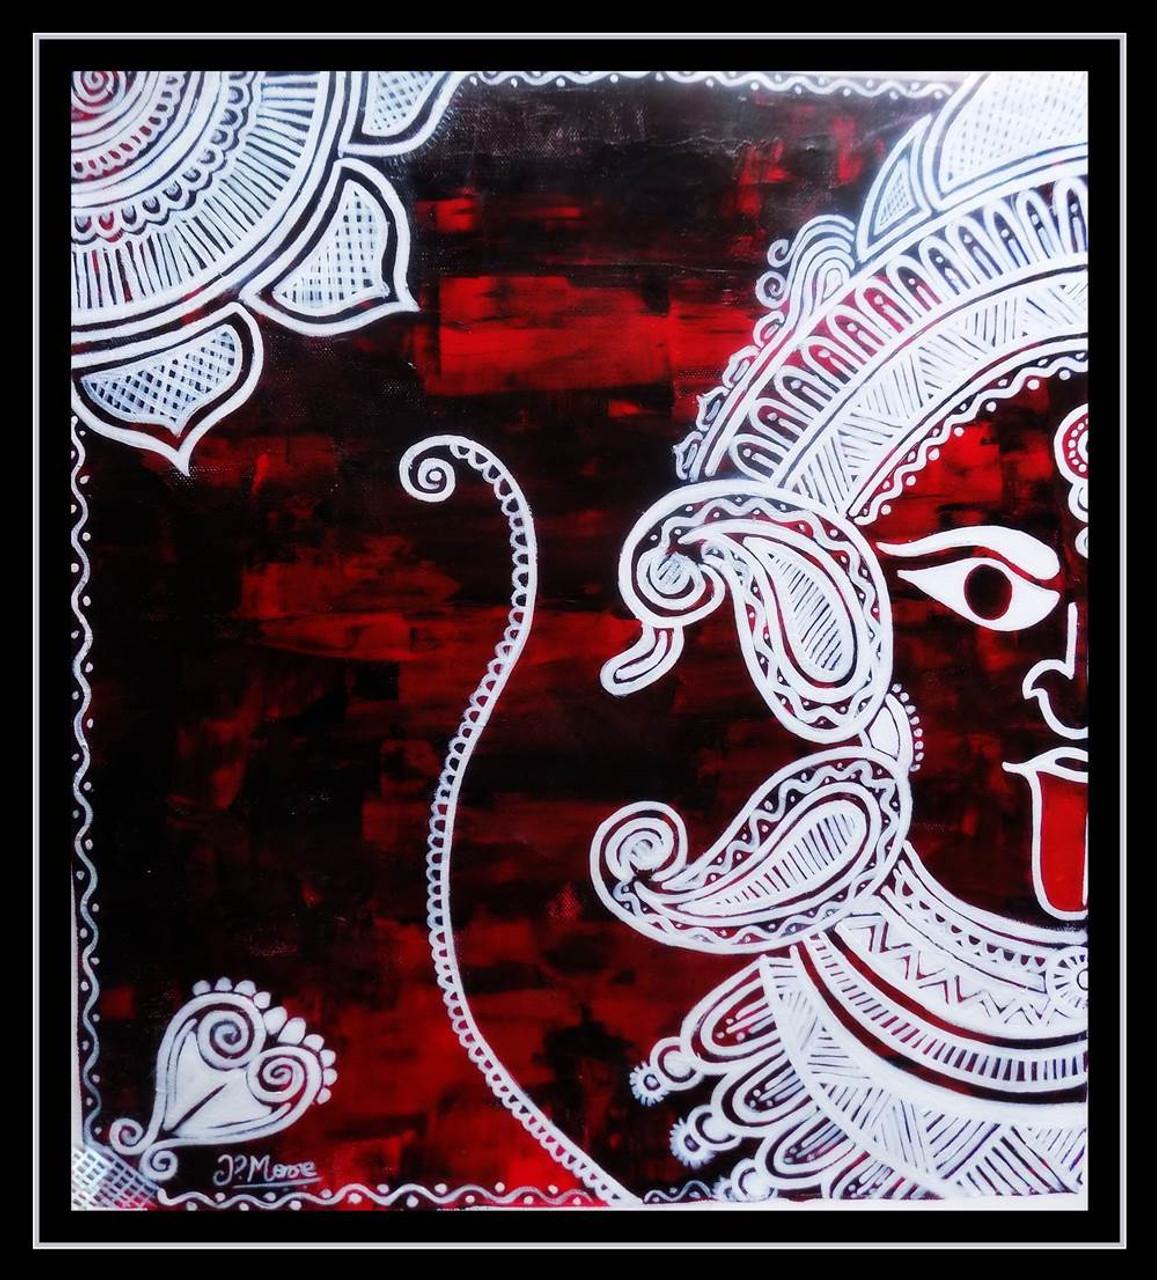 Maa Kali Rangoli Art 1033 4438 Handpainted Art Painting 20in X 21in Framed